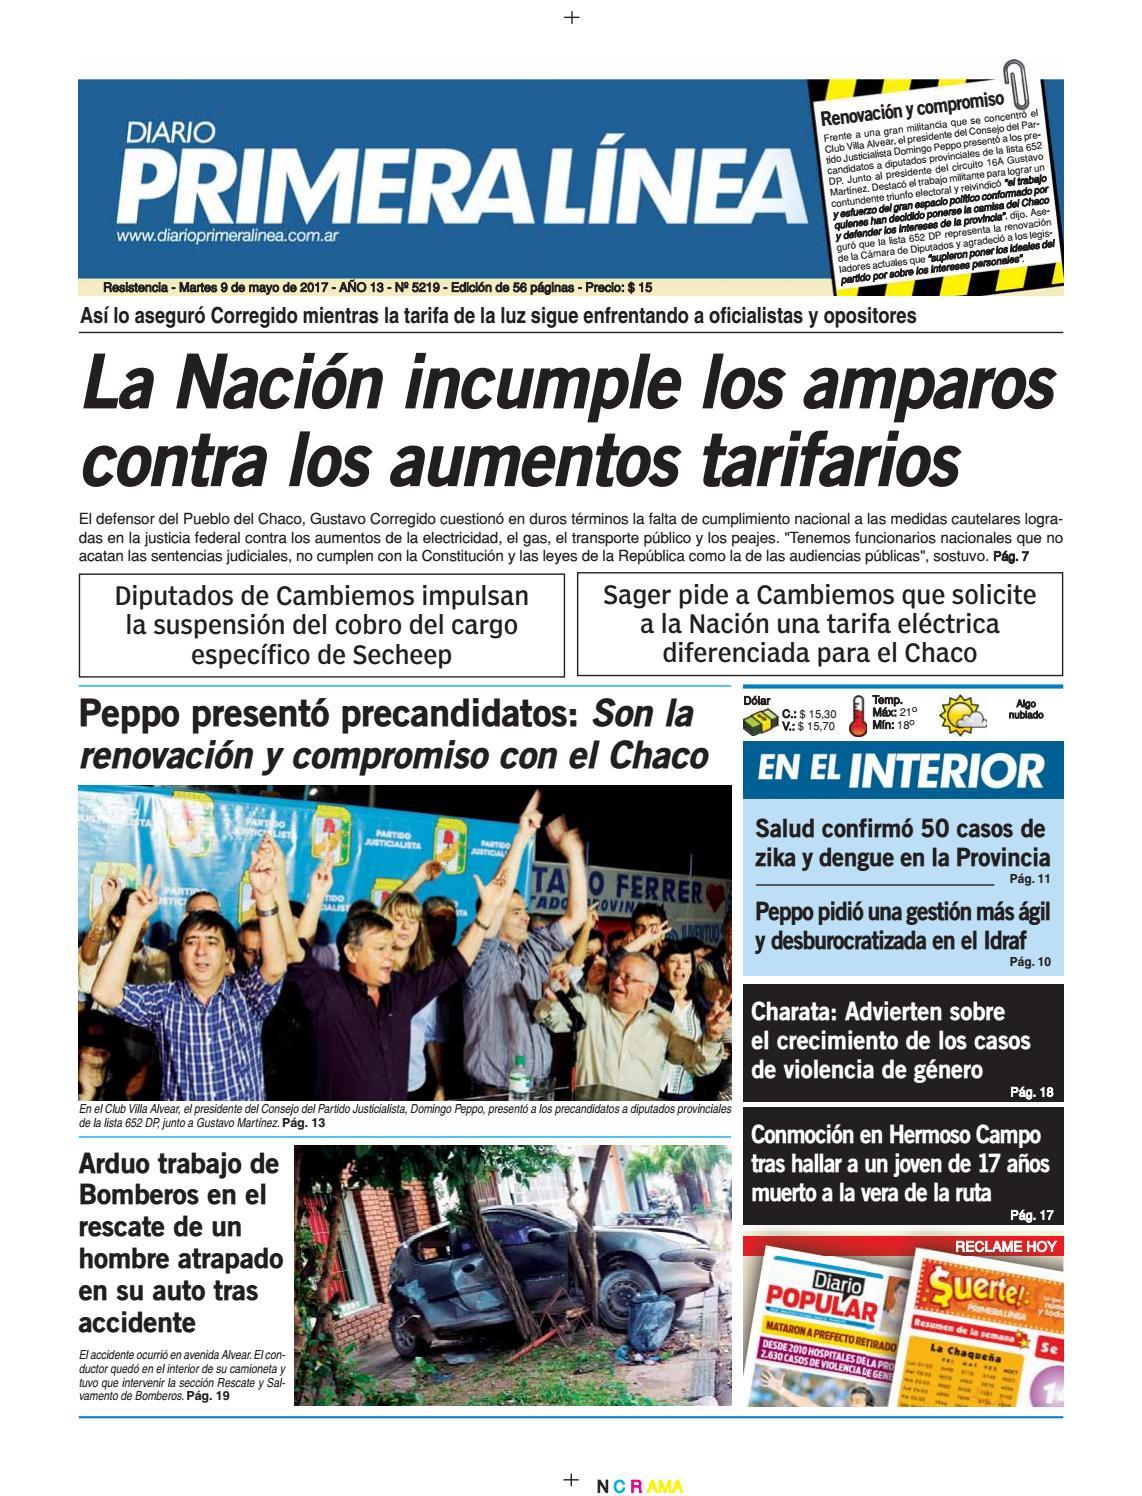 Primera L Nea 5226 16 05 17 By Diario Primera Linea Issuu # Muebles Goitia Tijuana